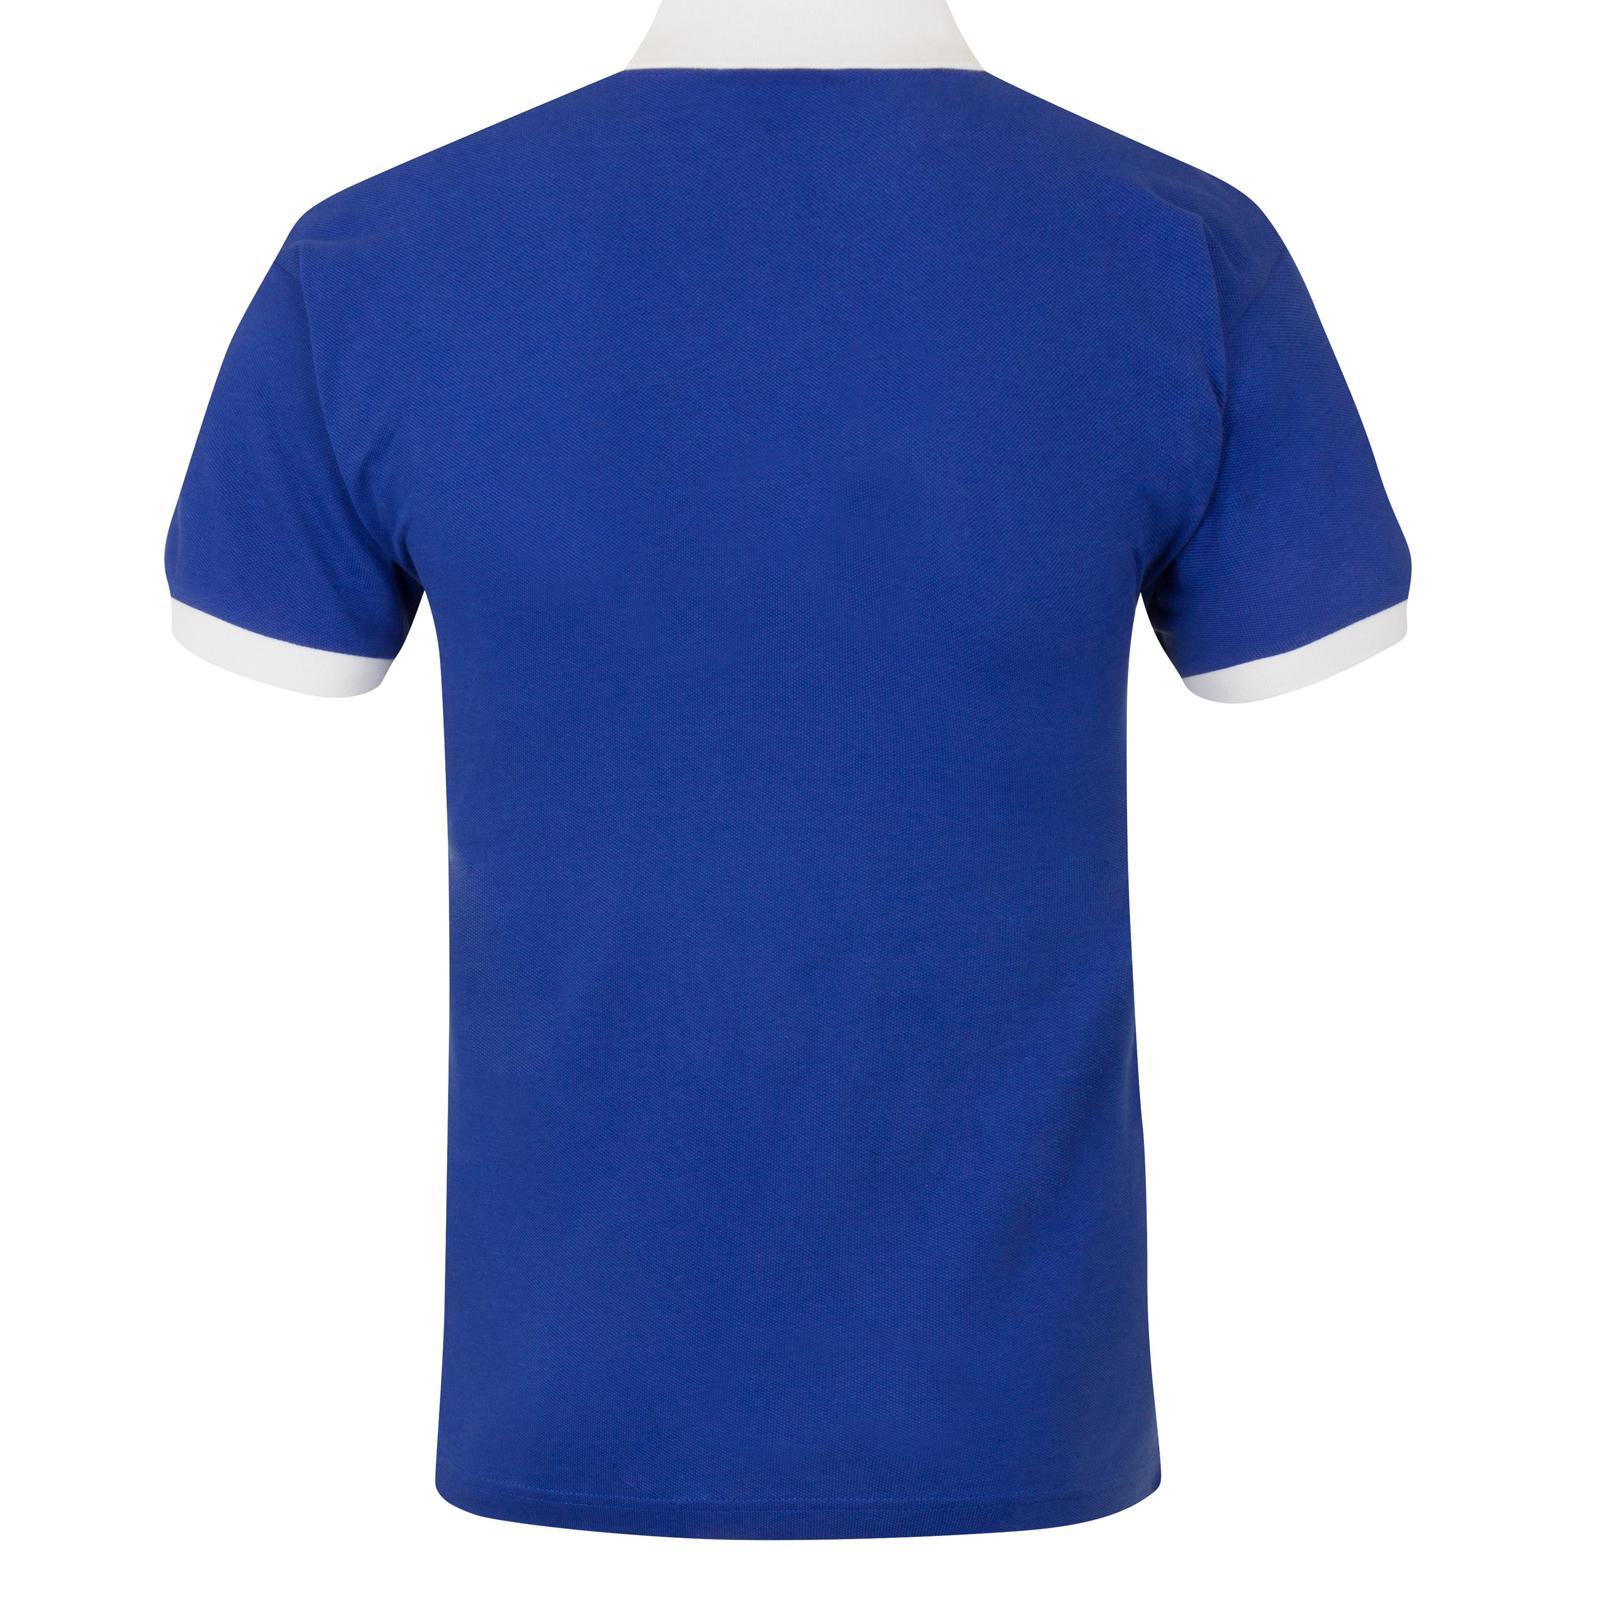 Chelsea FC Official Football Gift Mens 1972 1976 Retro Home Kit Shirt